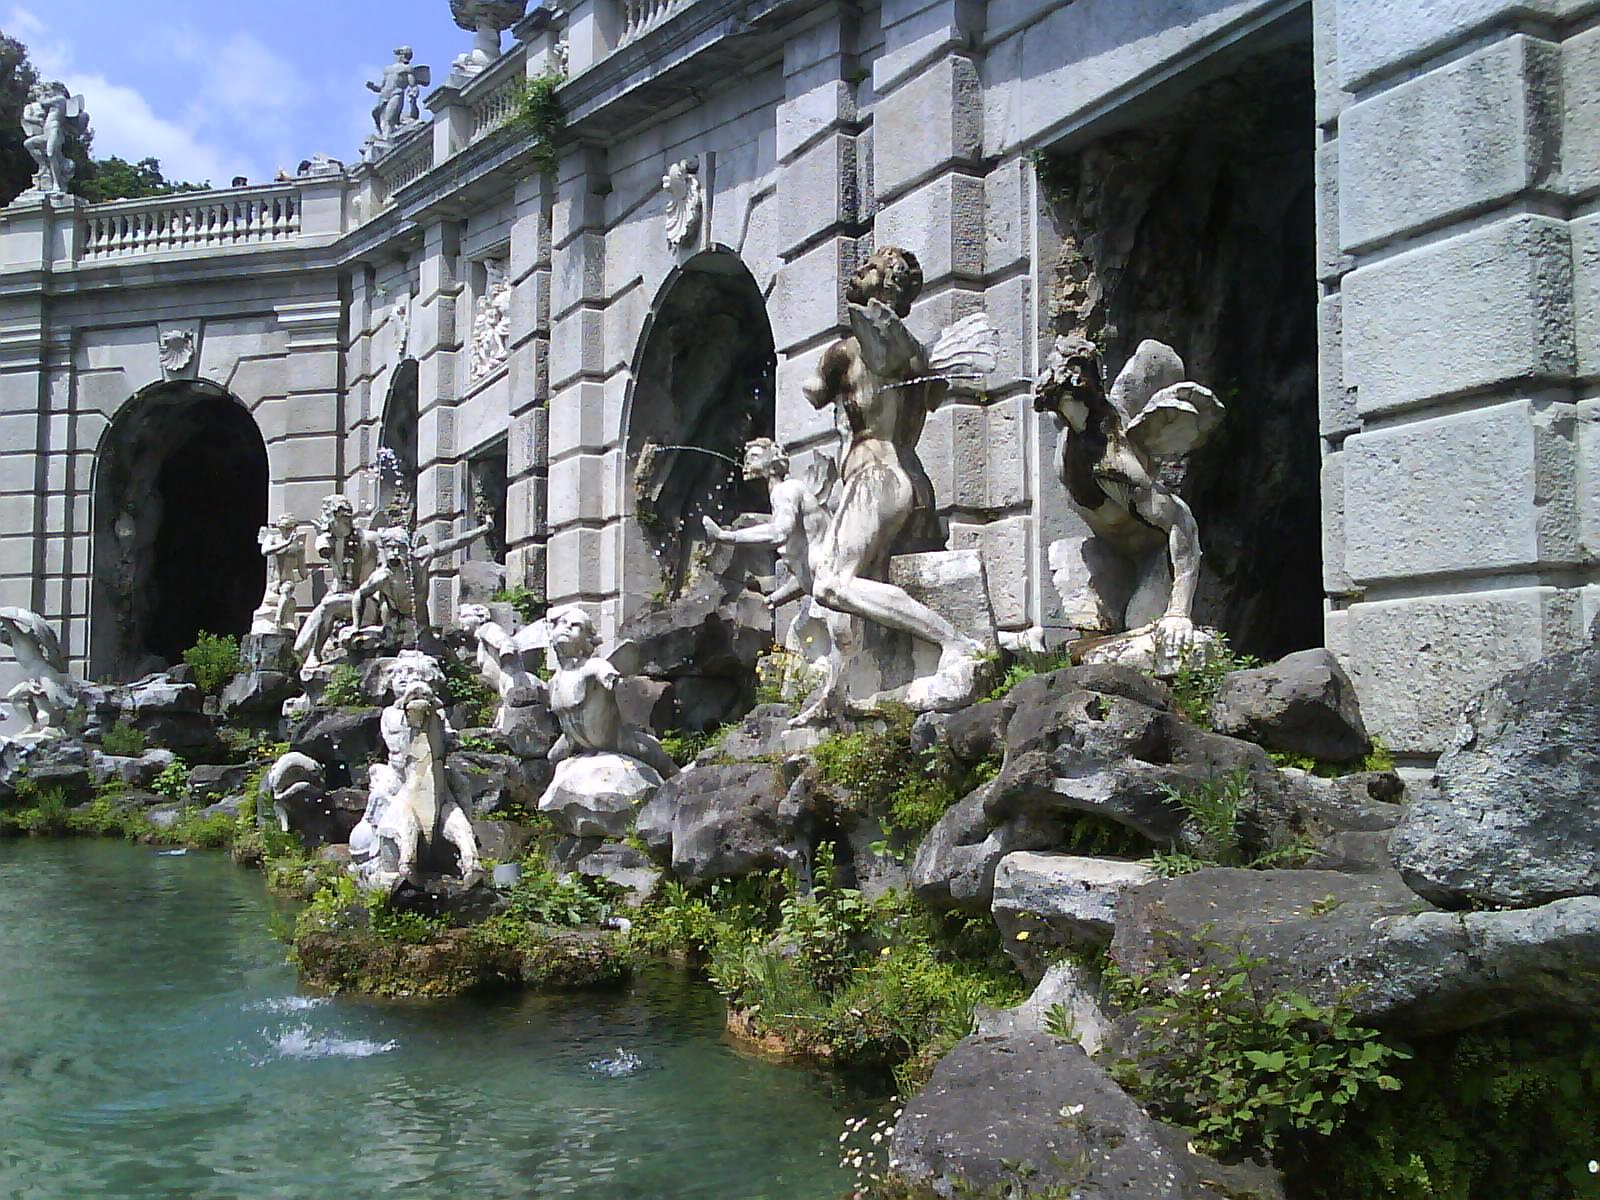 caserta giardino12